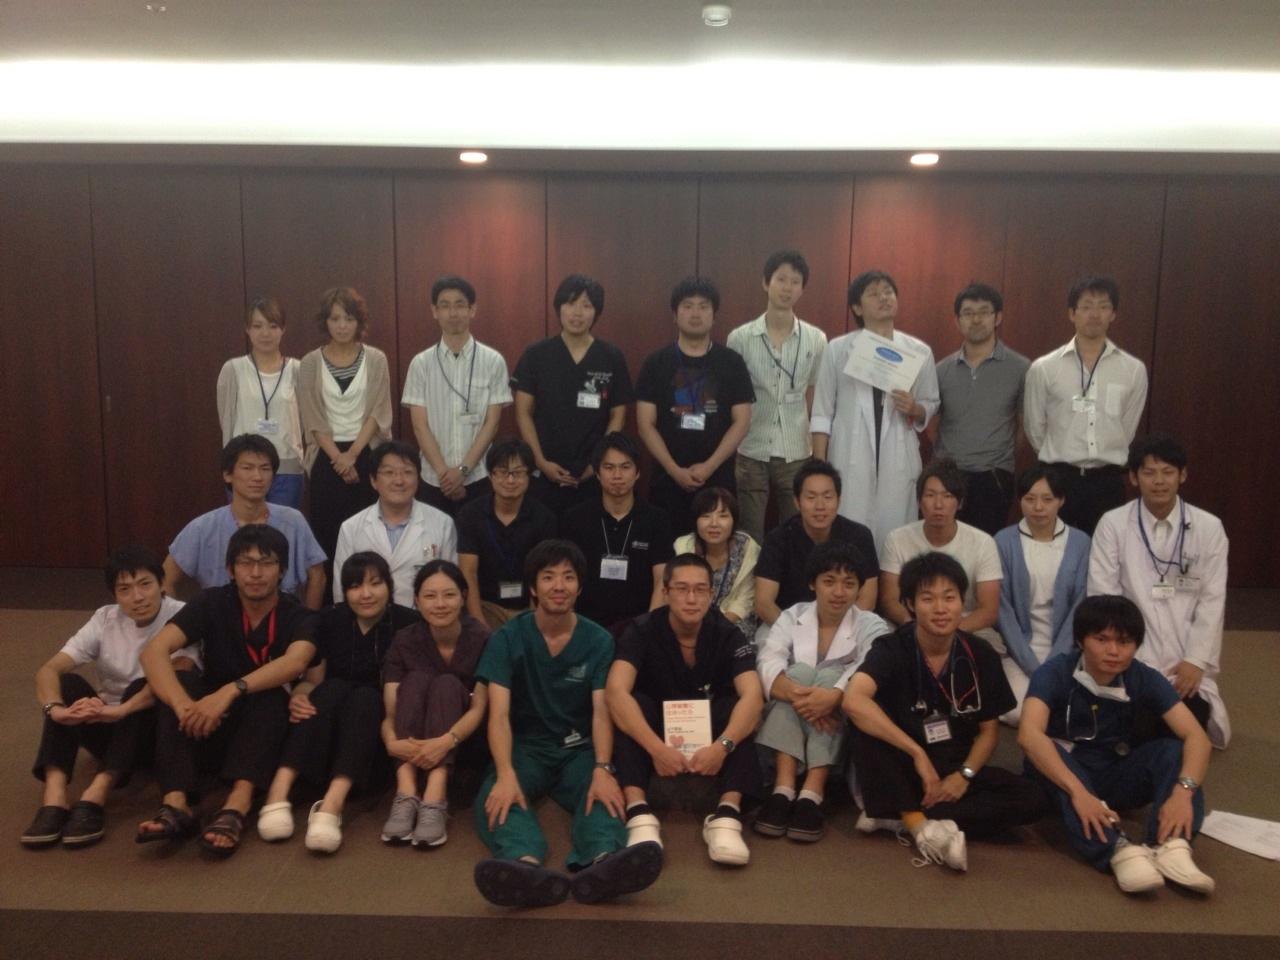 http://blog.higashi-tokushukai.or.jp/ydblog/2013/08/03/%E5%86%99%E7%9C%9F%20%285%29.JPG